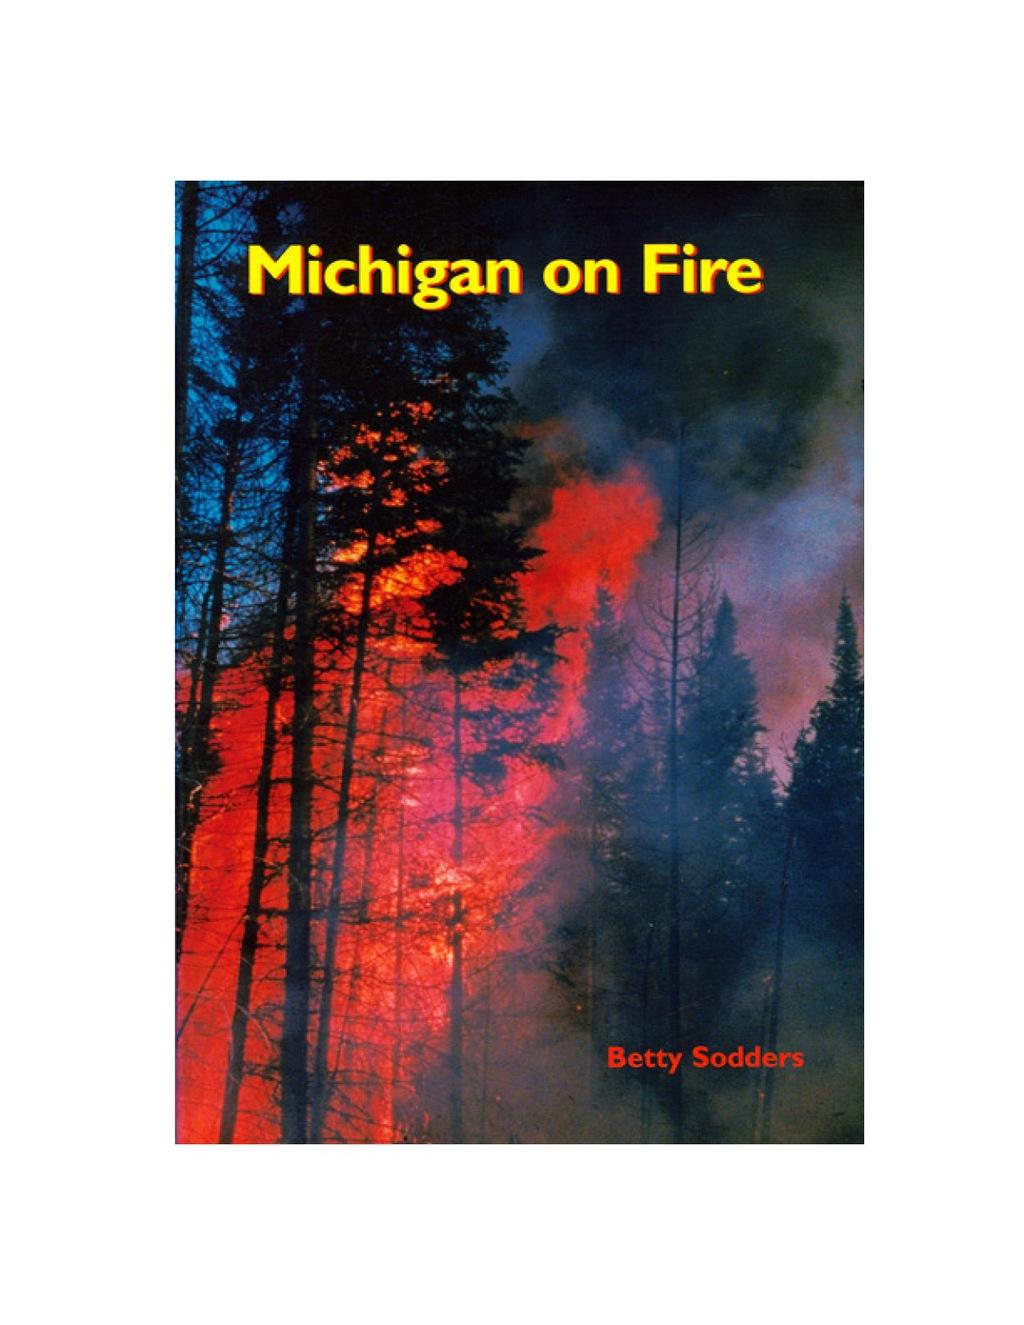 By Sodders,  Betty PRINTISBN: 9781882376520 E-TEXT ISBN: 9781620260104 Edition: 0